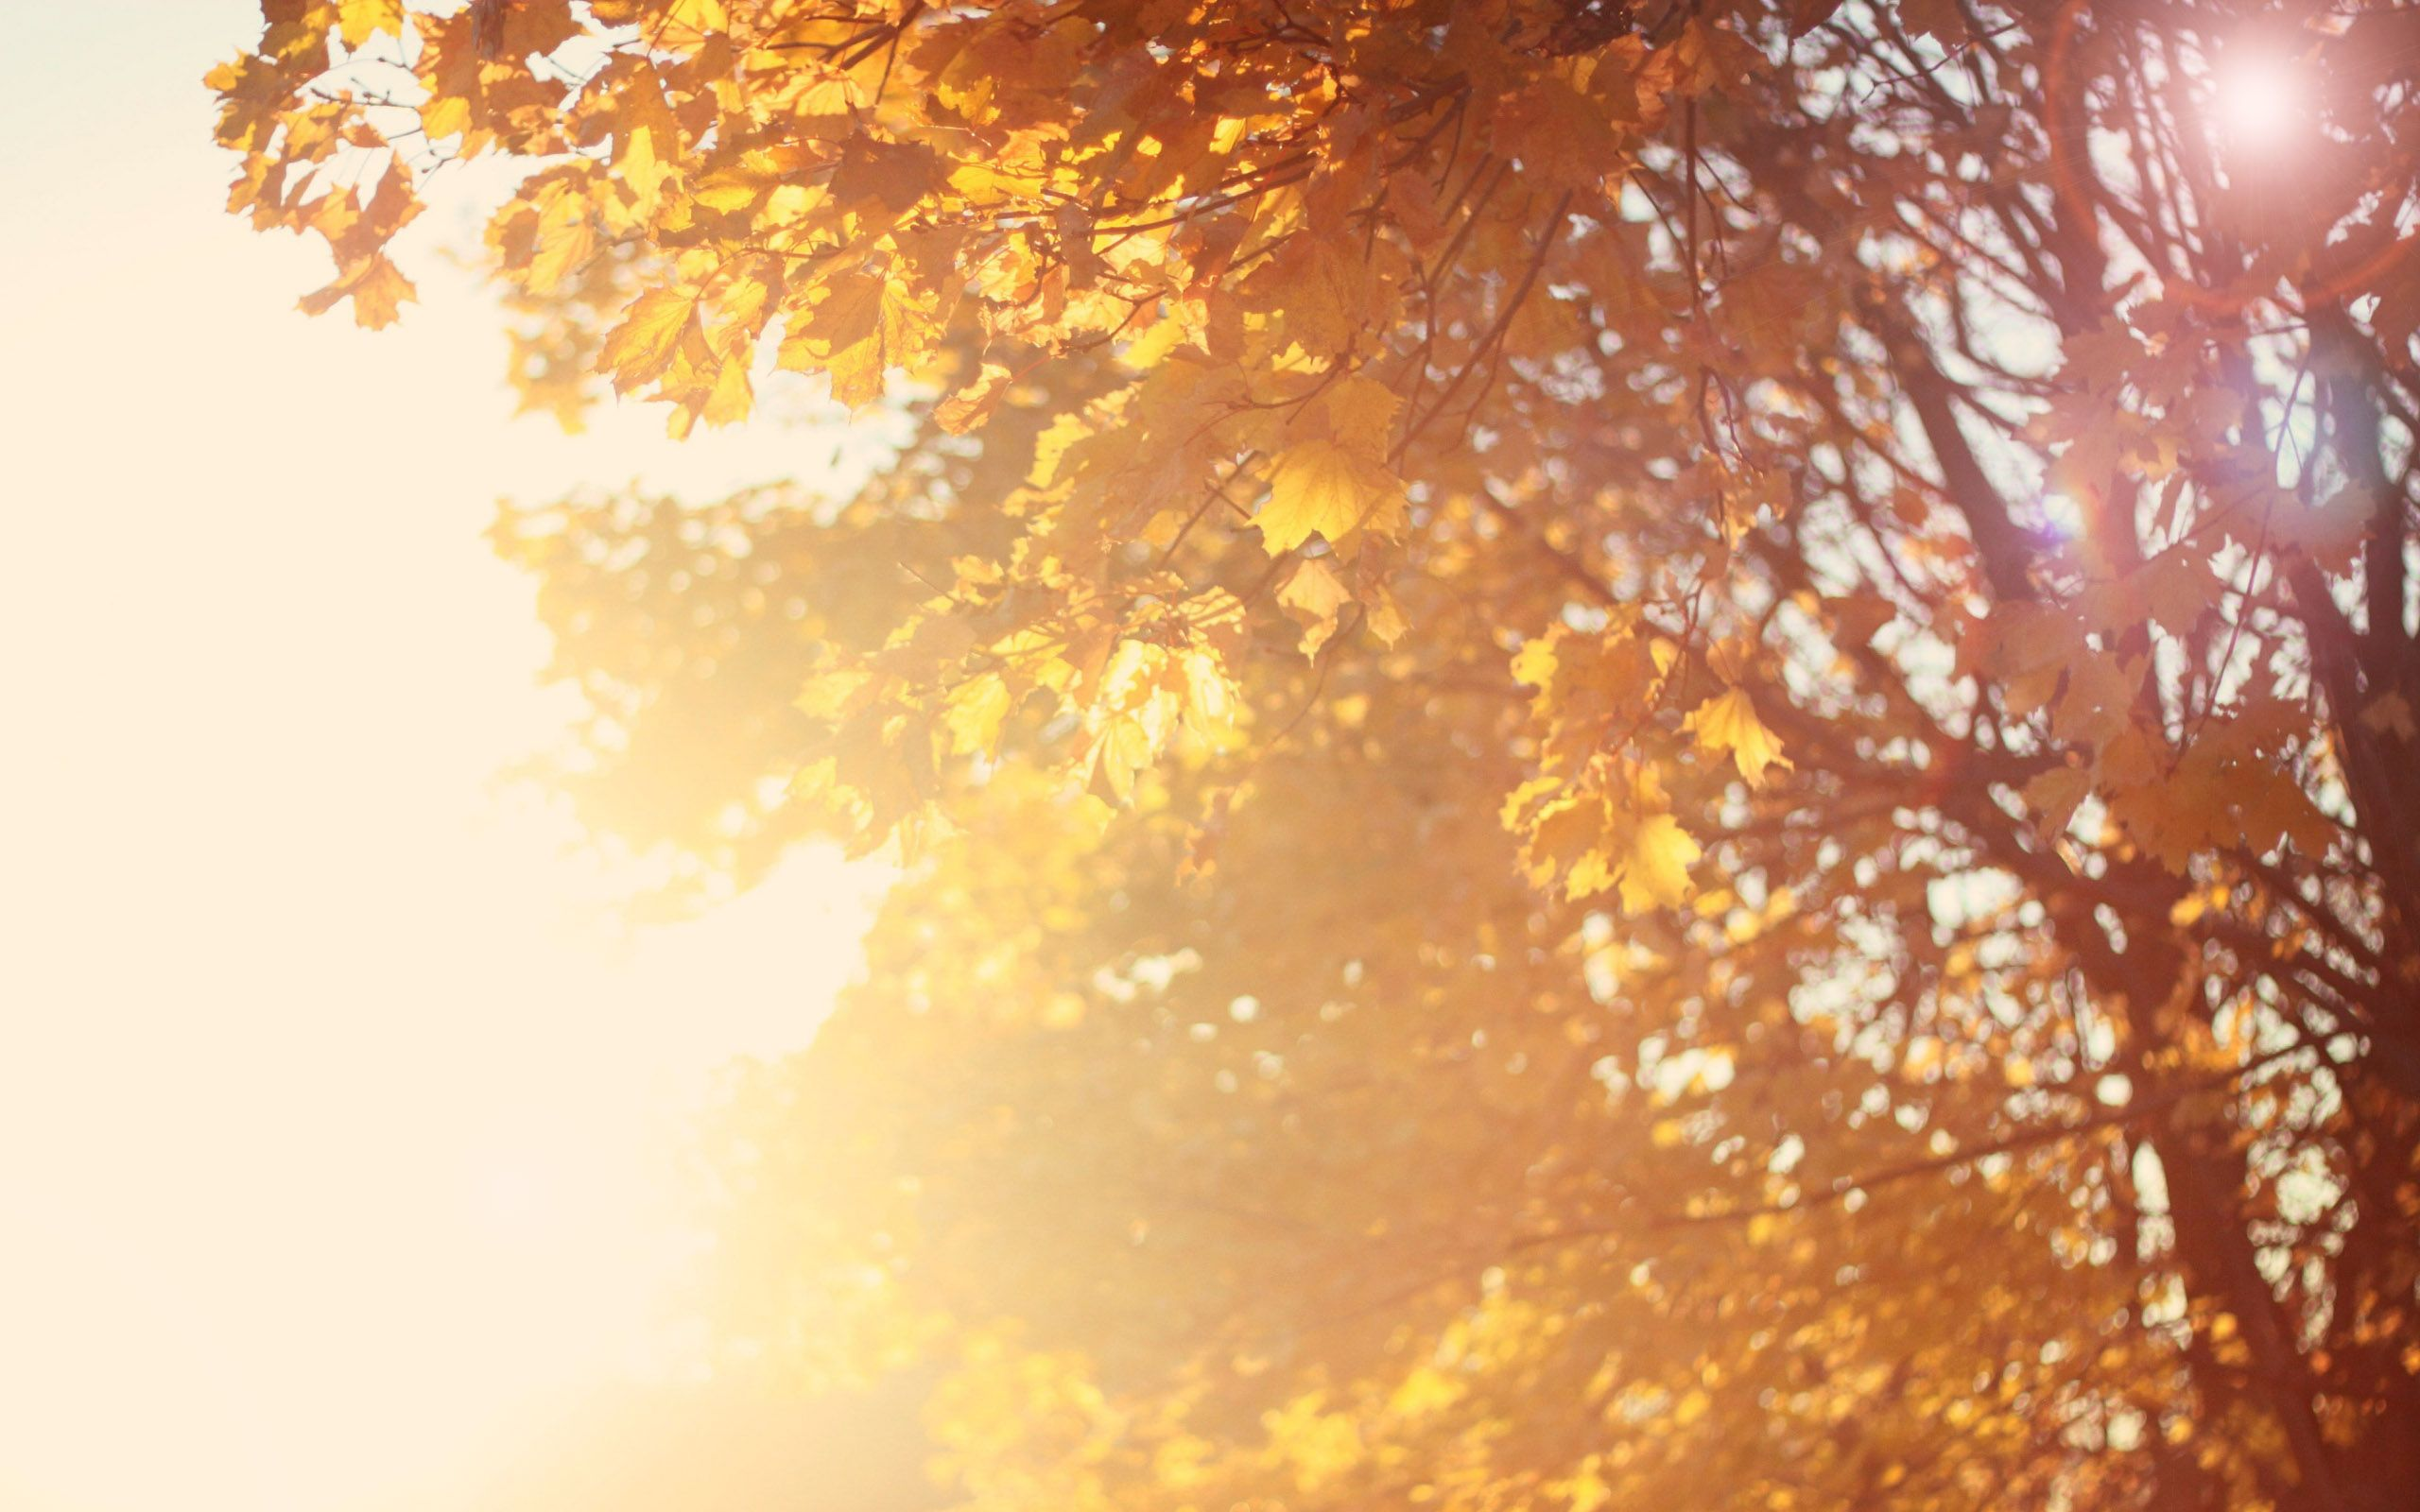 mac backgrounds hd fall autumn hd apple mac desktop wallpapers hd autumn gold mac background